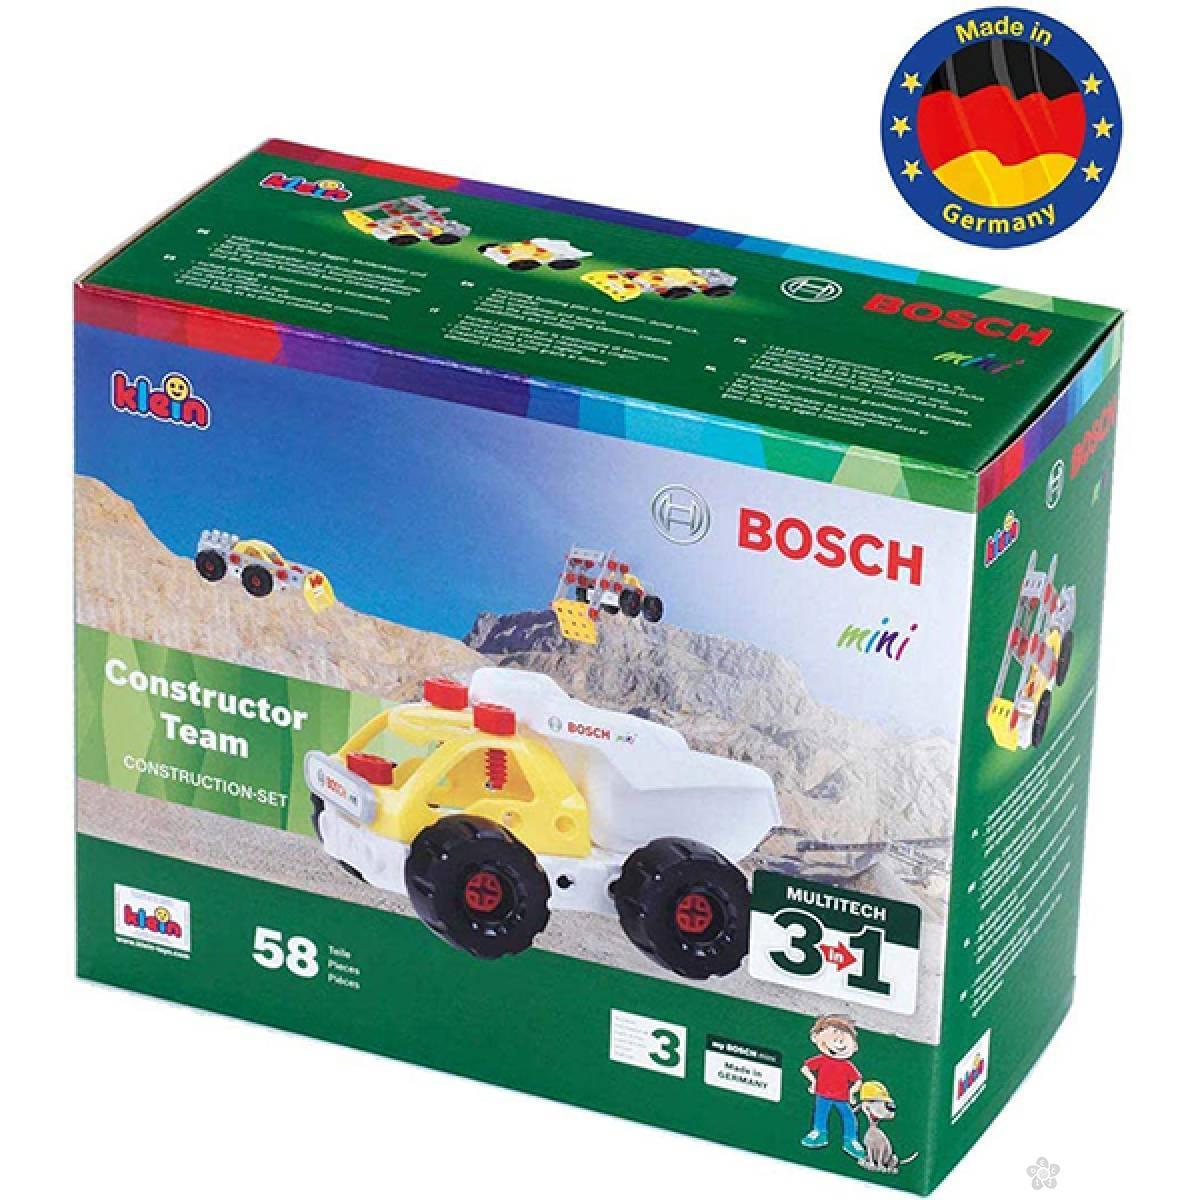 Bosch 3 u 1 Konstruktor tim Klein KL8792